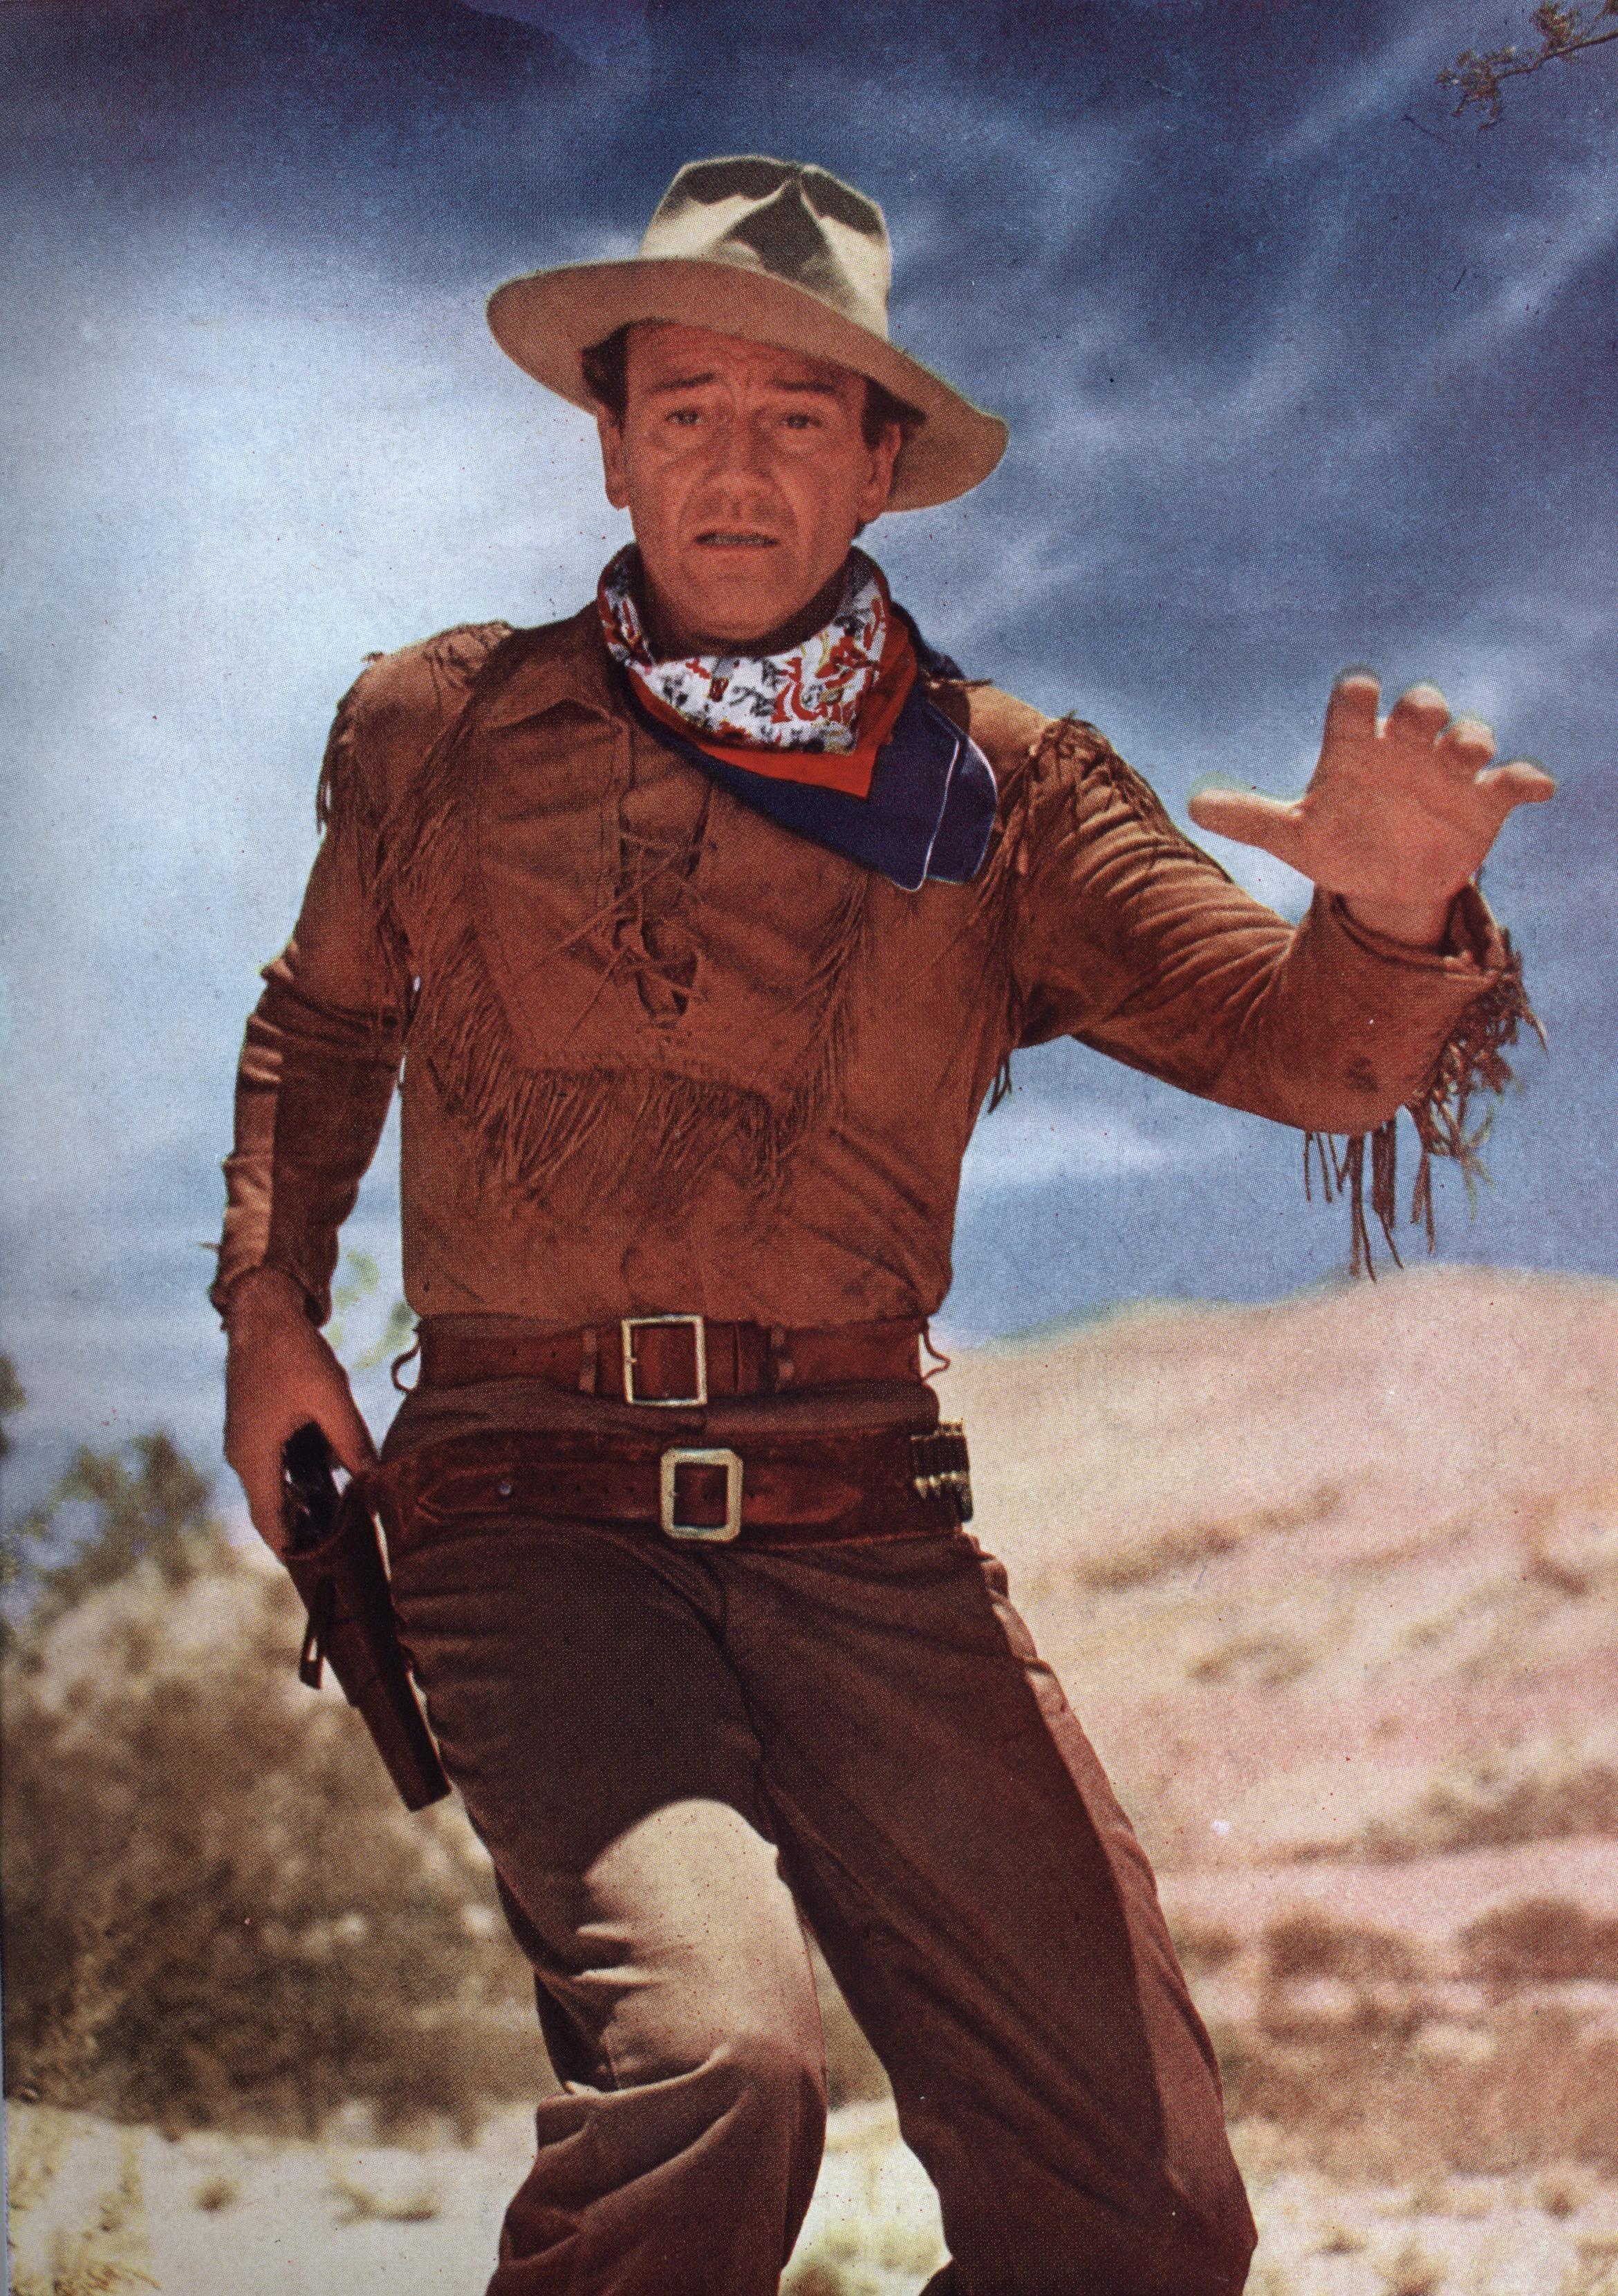 Bruce Dern on shooting John Wayne in